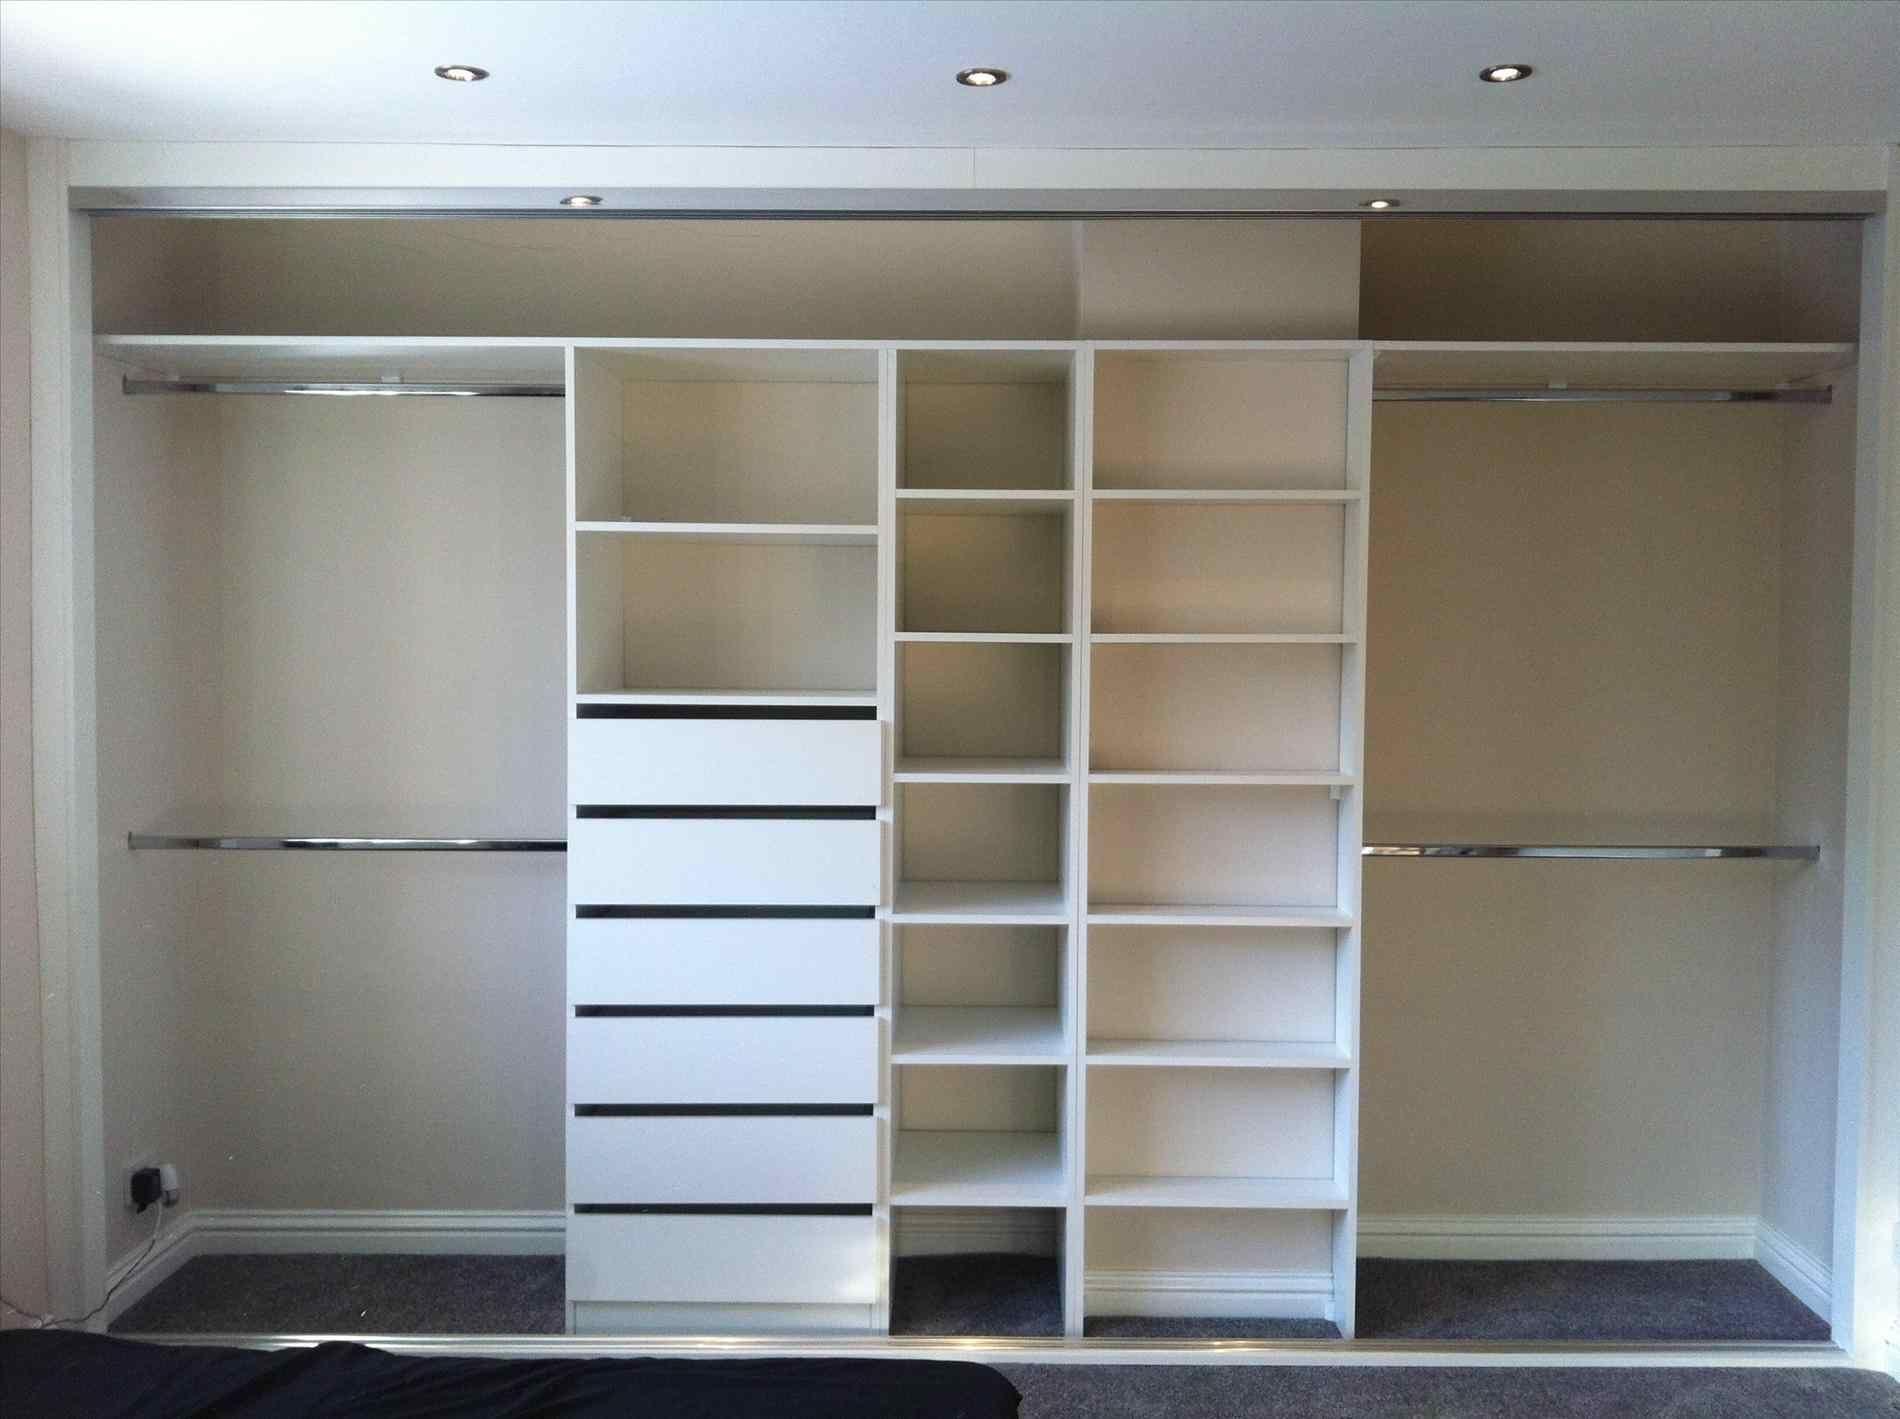 Modern Wardrobes Designs Bedrooms Build A Closet Closet Bedroom Bedroom Closet Design